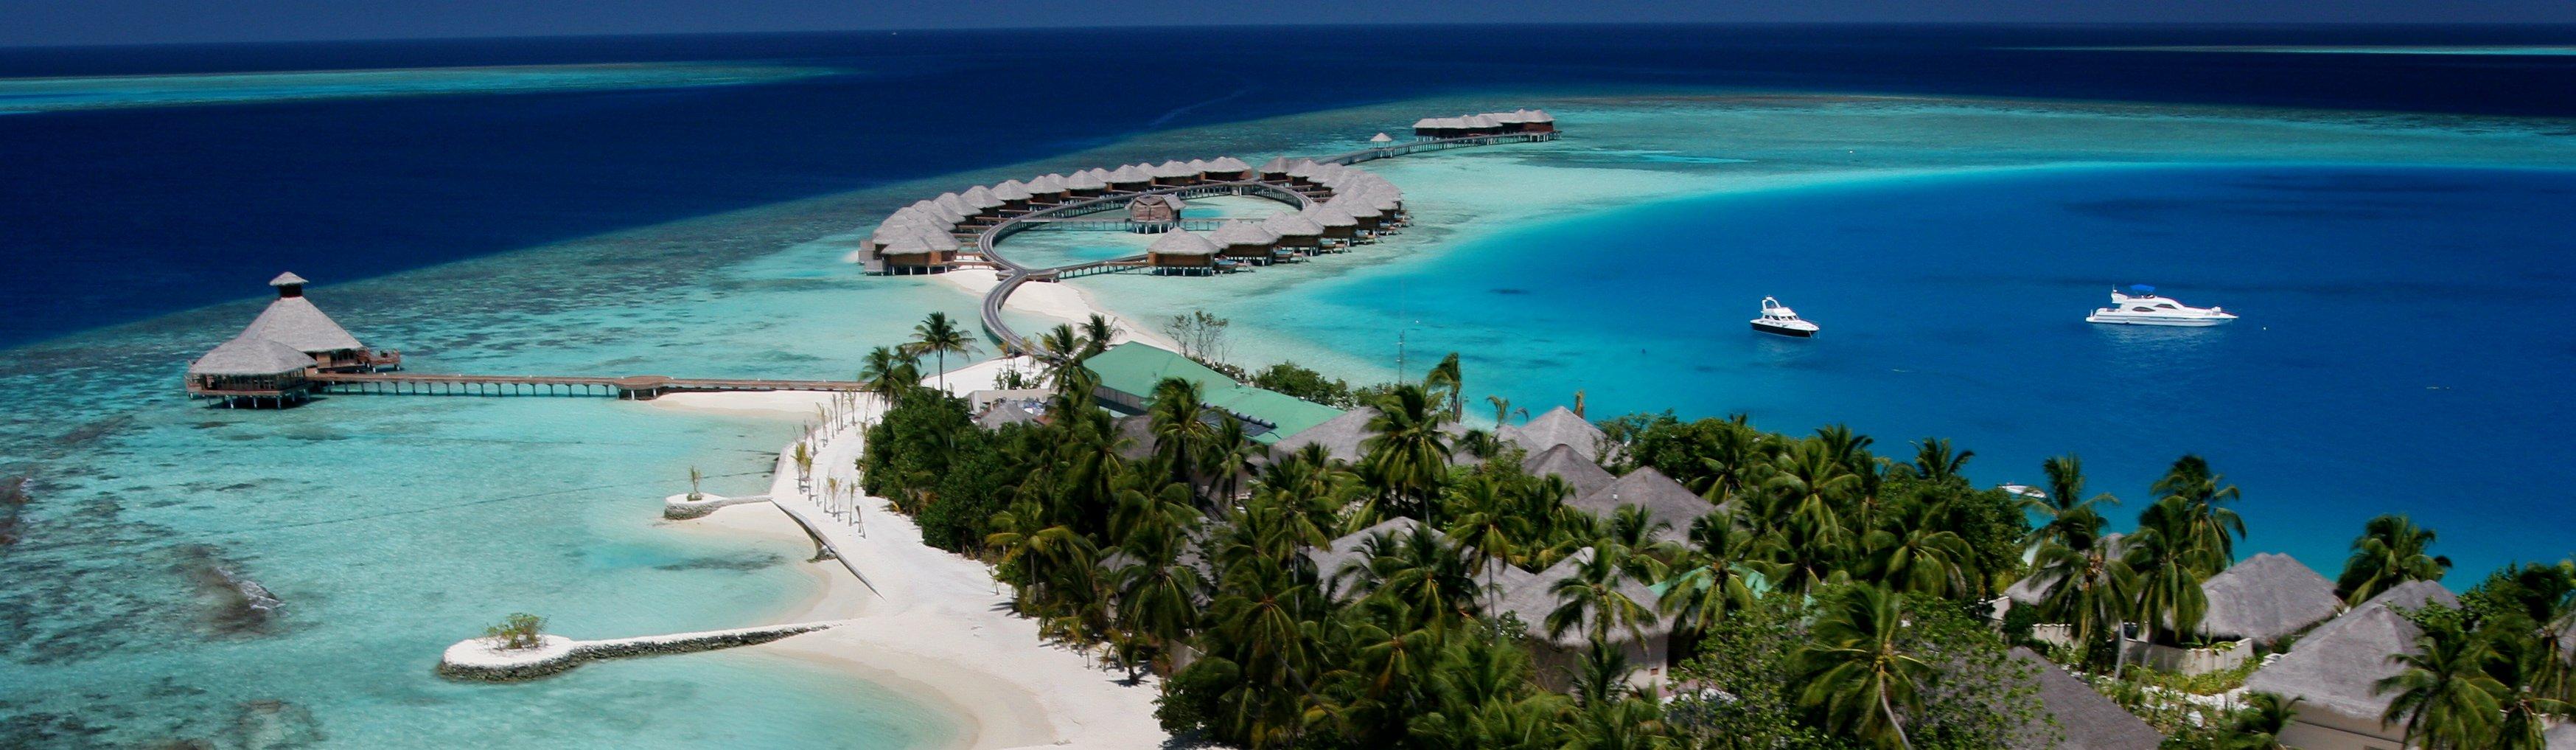 huvafen-fushi-luxury-resort-maldives